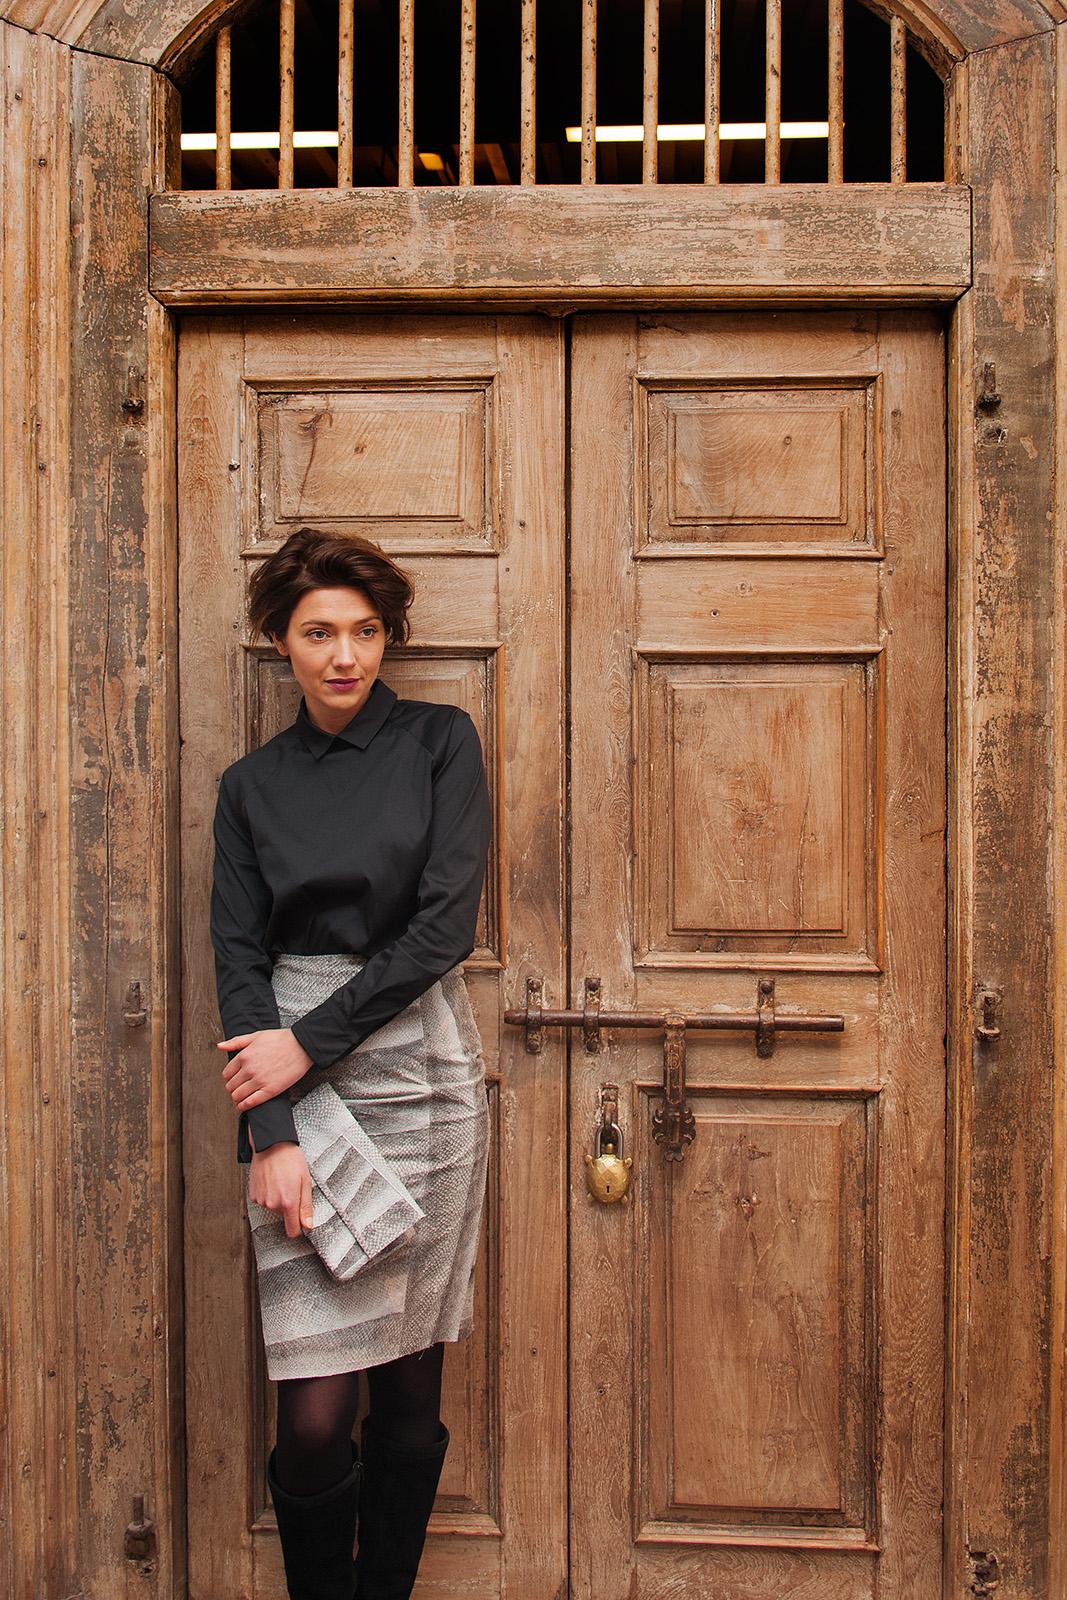 Modeservice zalmleer kleding van Map Renes